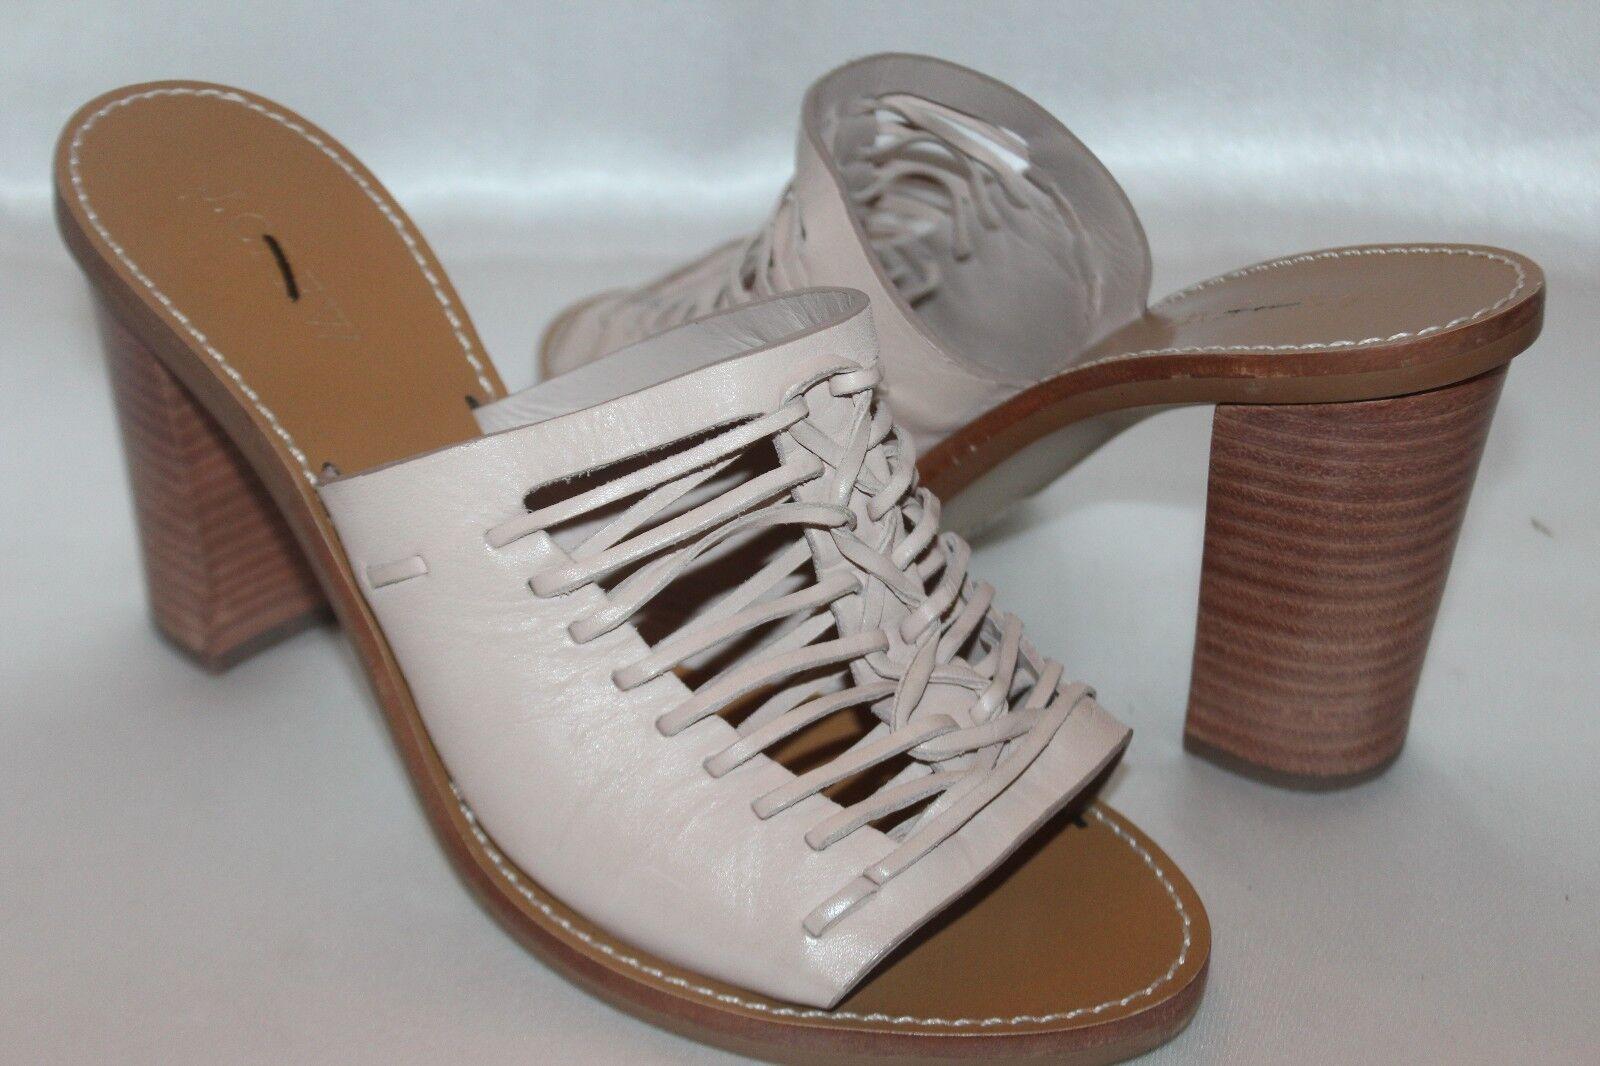 NEW  J CREW Woven Slides Nude Leder Open Toe Slides Woven Sandales Heels Sz 8 158 c85d91